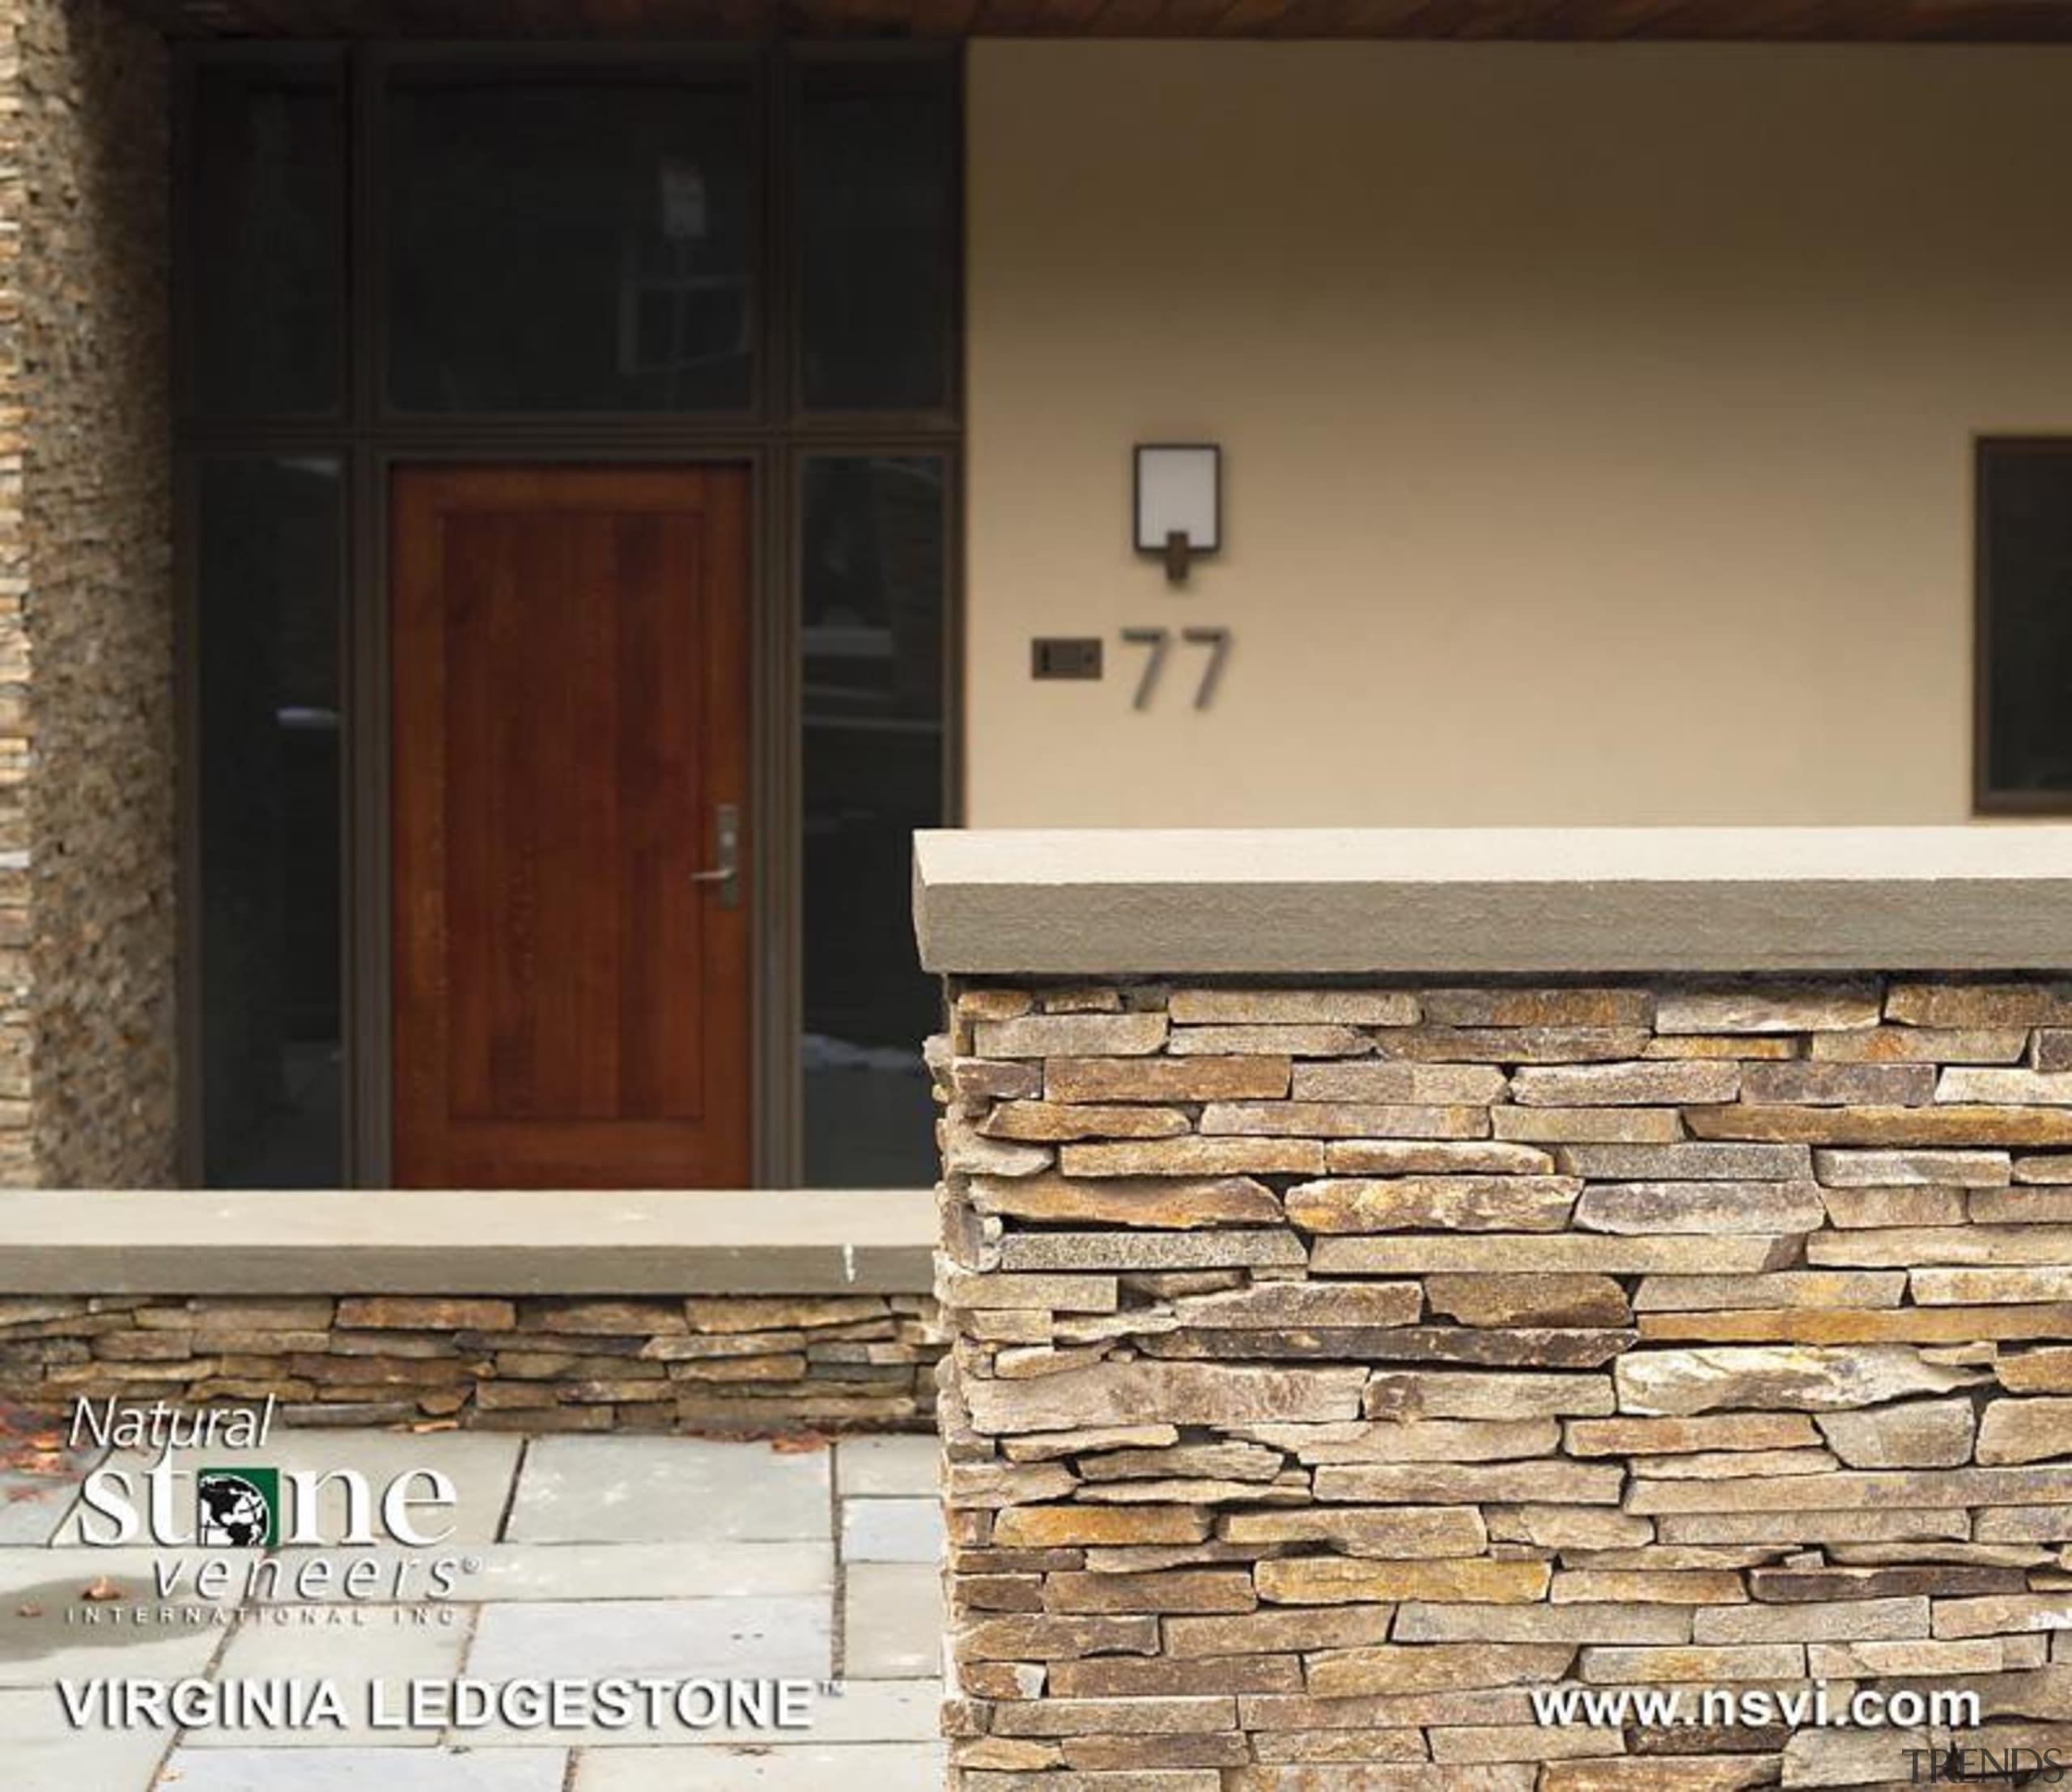 Ledgestone Collection -More Virginia Ledgestone™ photos can be brick, brickwork, floor, flooring, stone wall, wall, window, wood, wood stain, brown